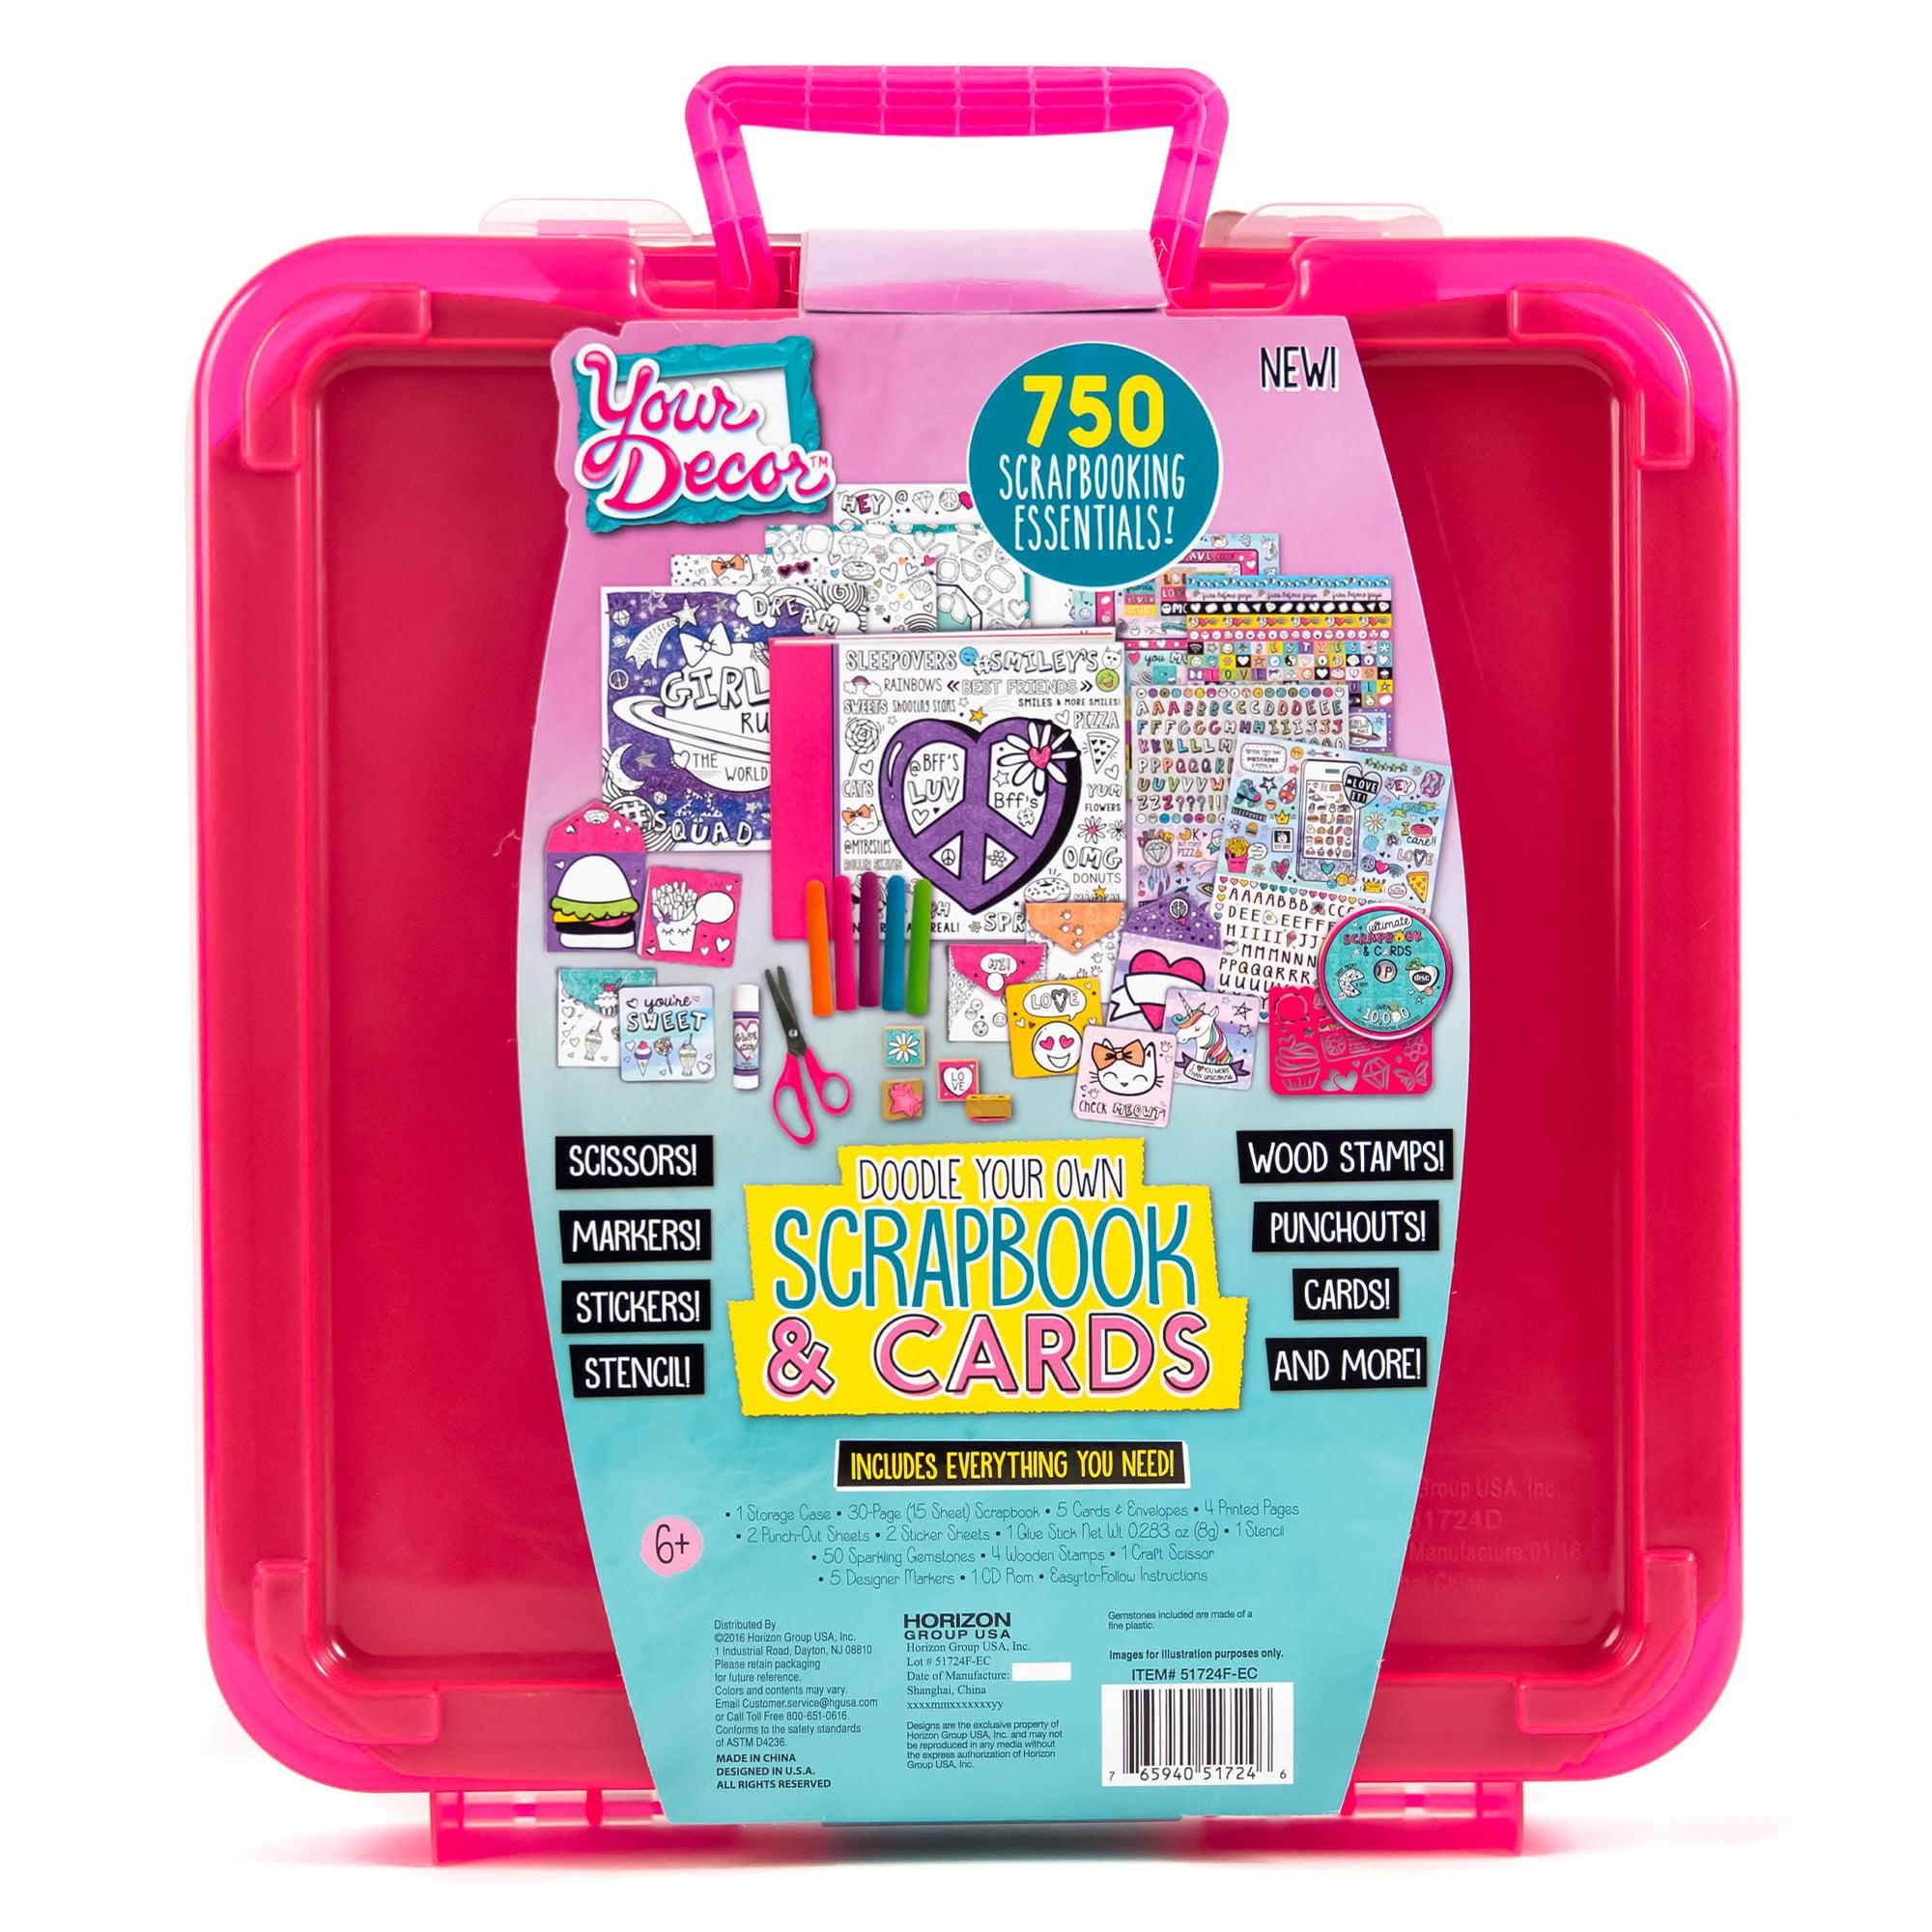 Scrapbook paper carrying case - Your Decor Scrapbook Amp Cards Kit By Horizon Group Usa Walmart Com